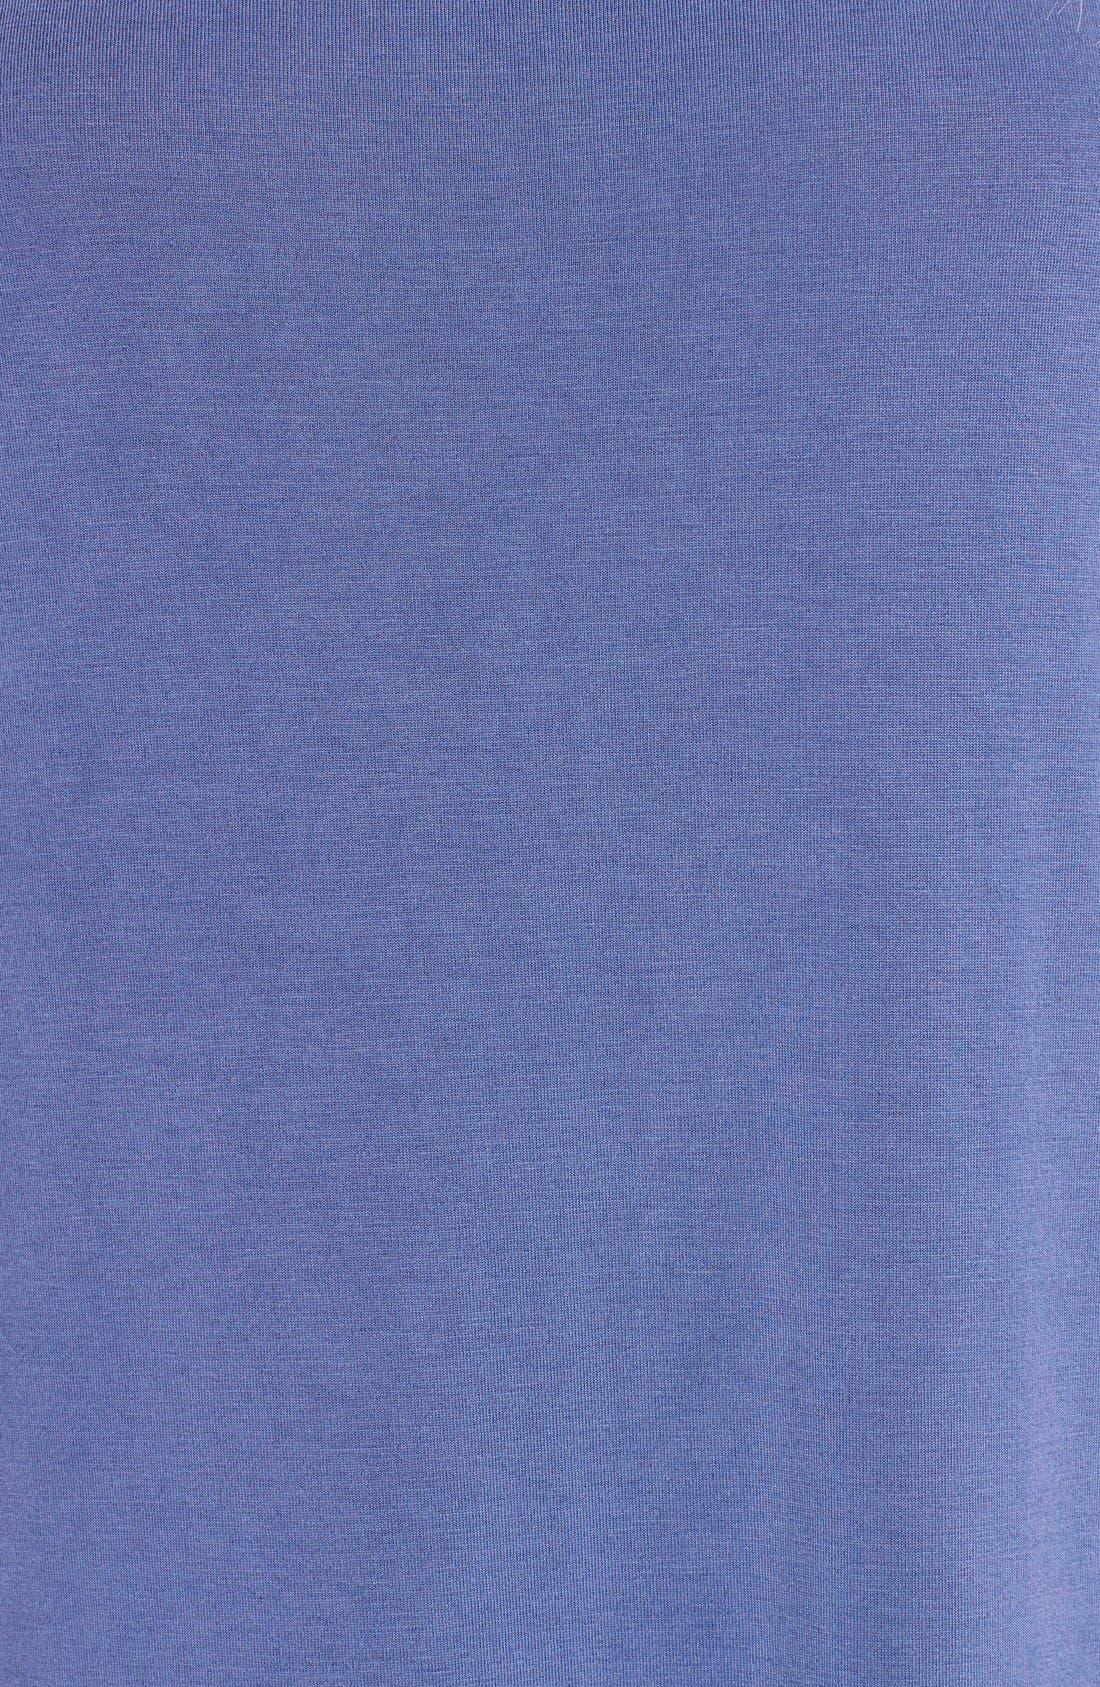 BCBGMAXAZRIA,                             'Raeghan' Racerback Jersey Maxi Dress,                             Alternate thumbnail 2, color,                             412